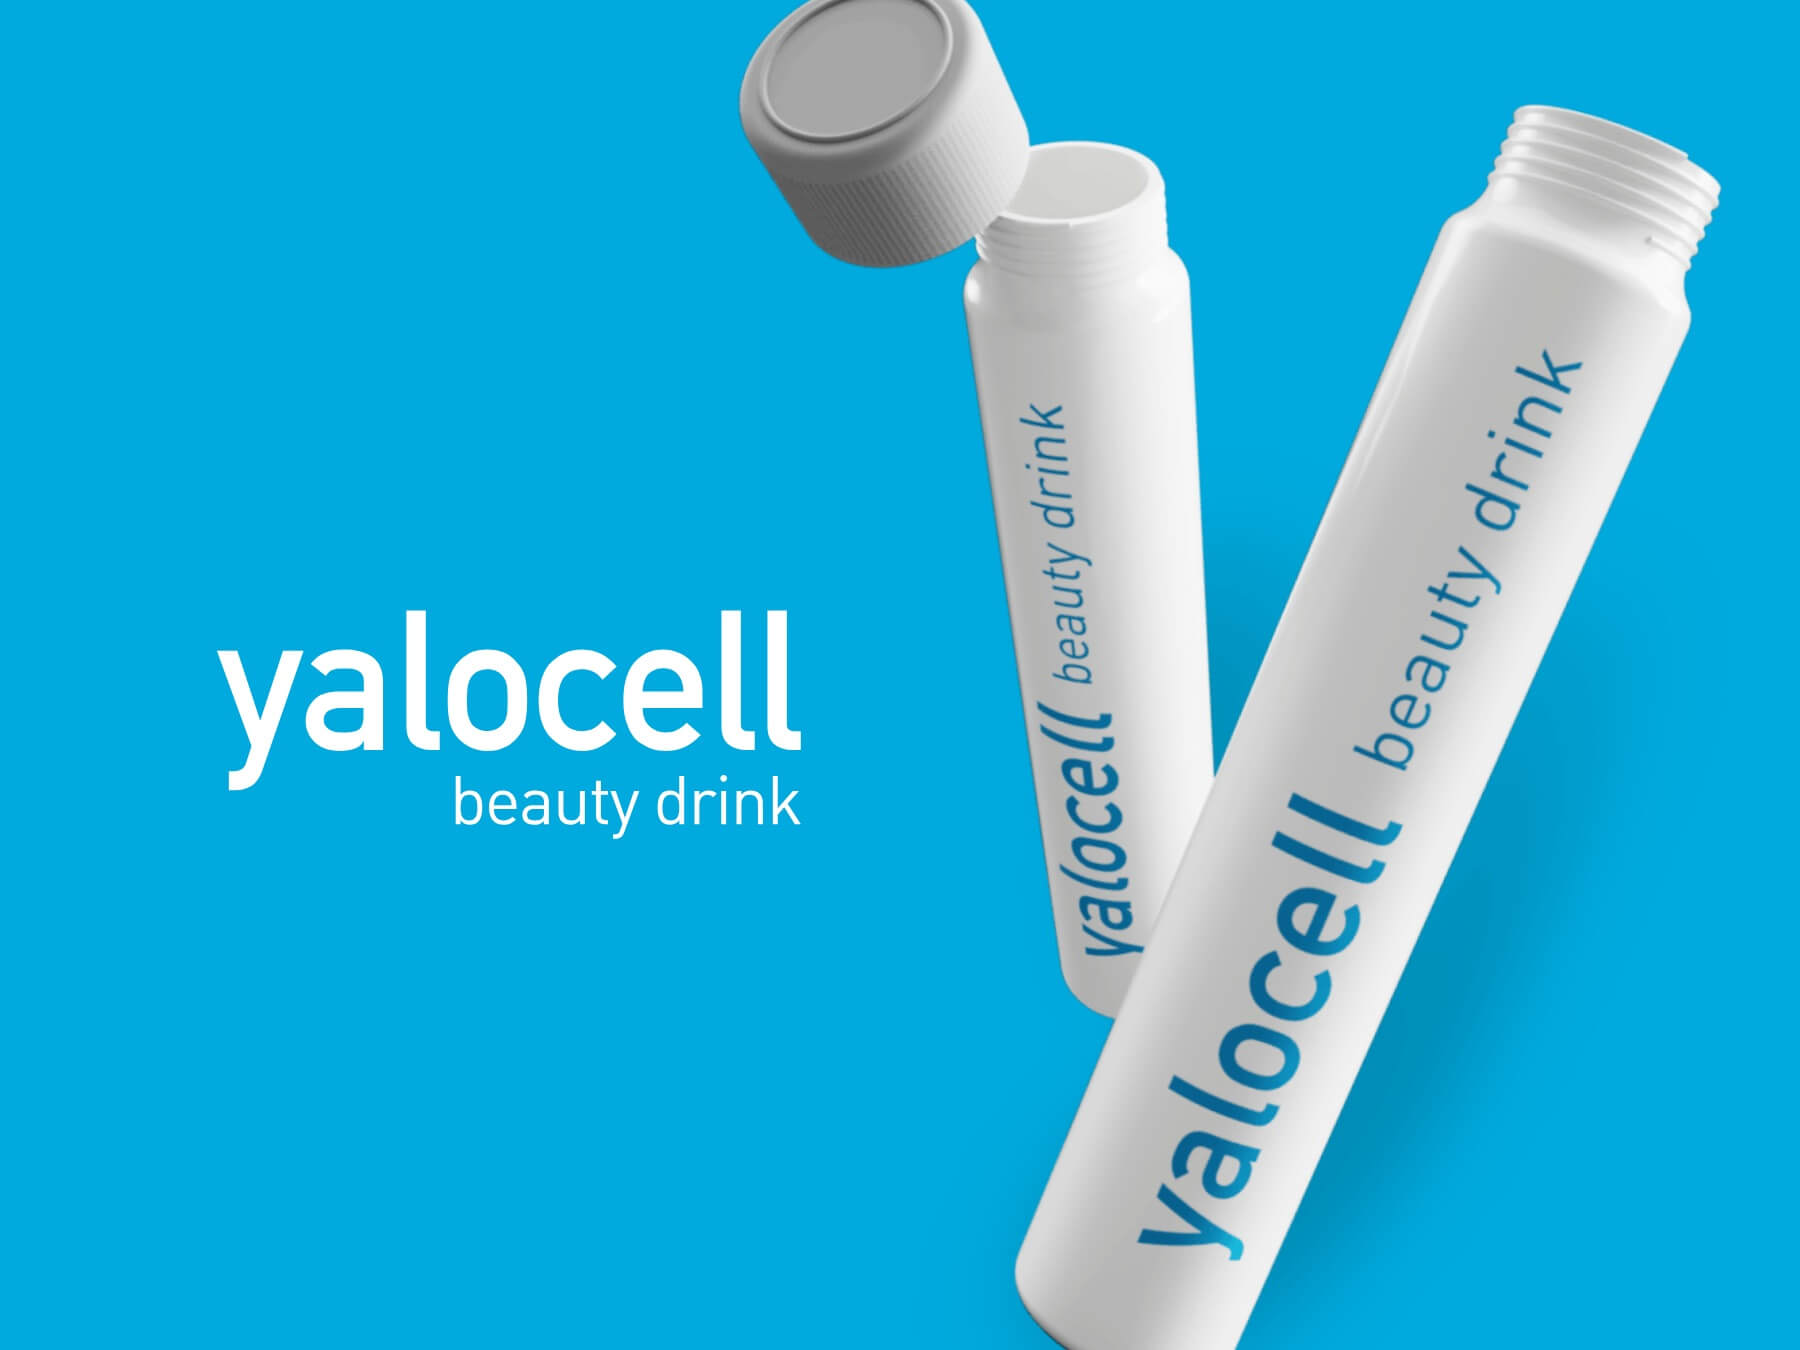 Yalocell beauty drink